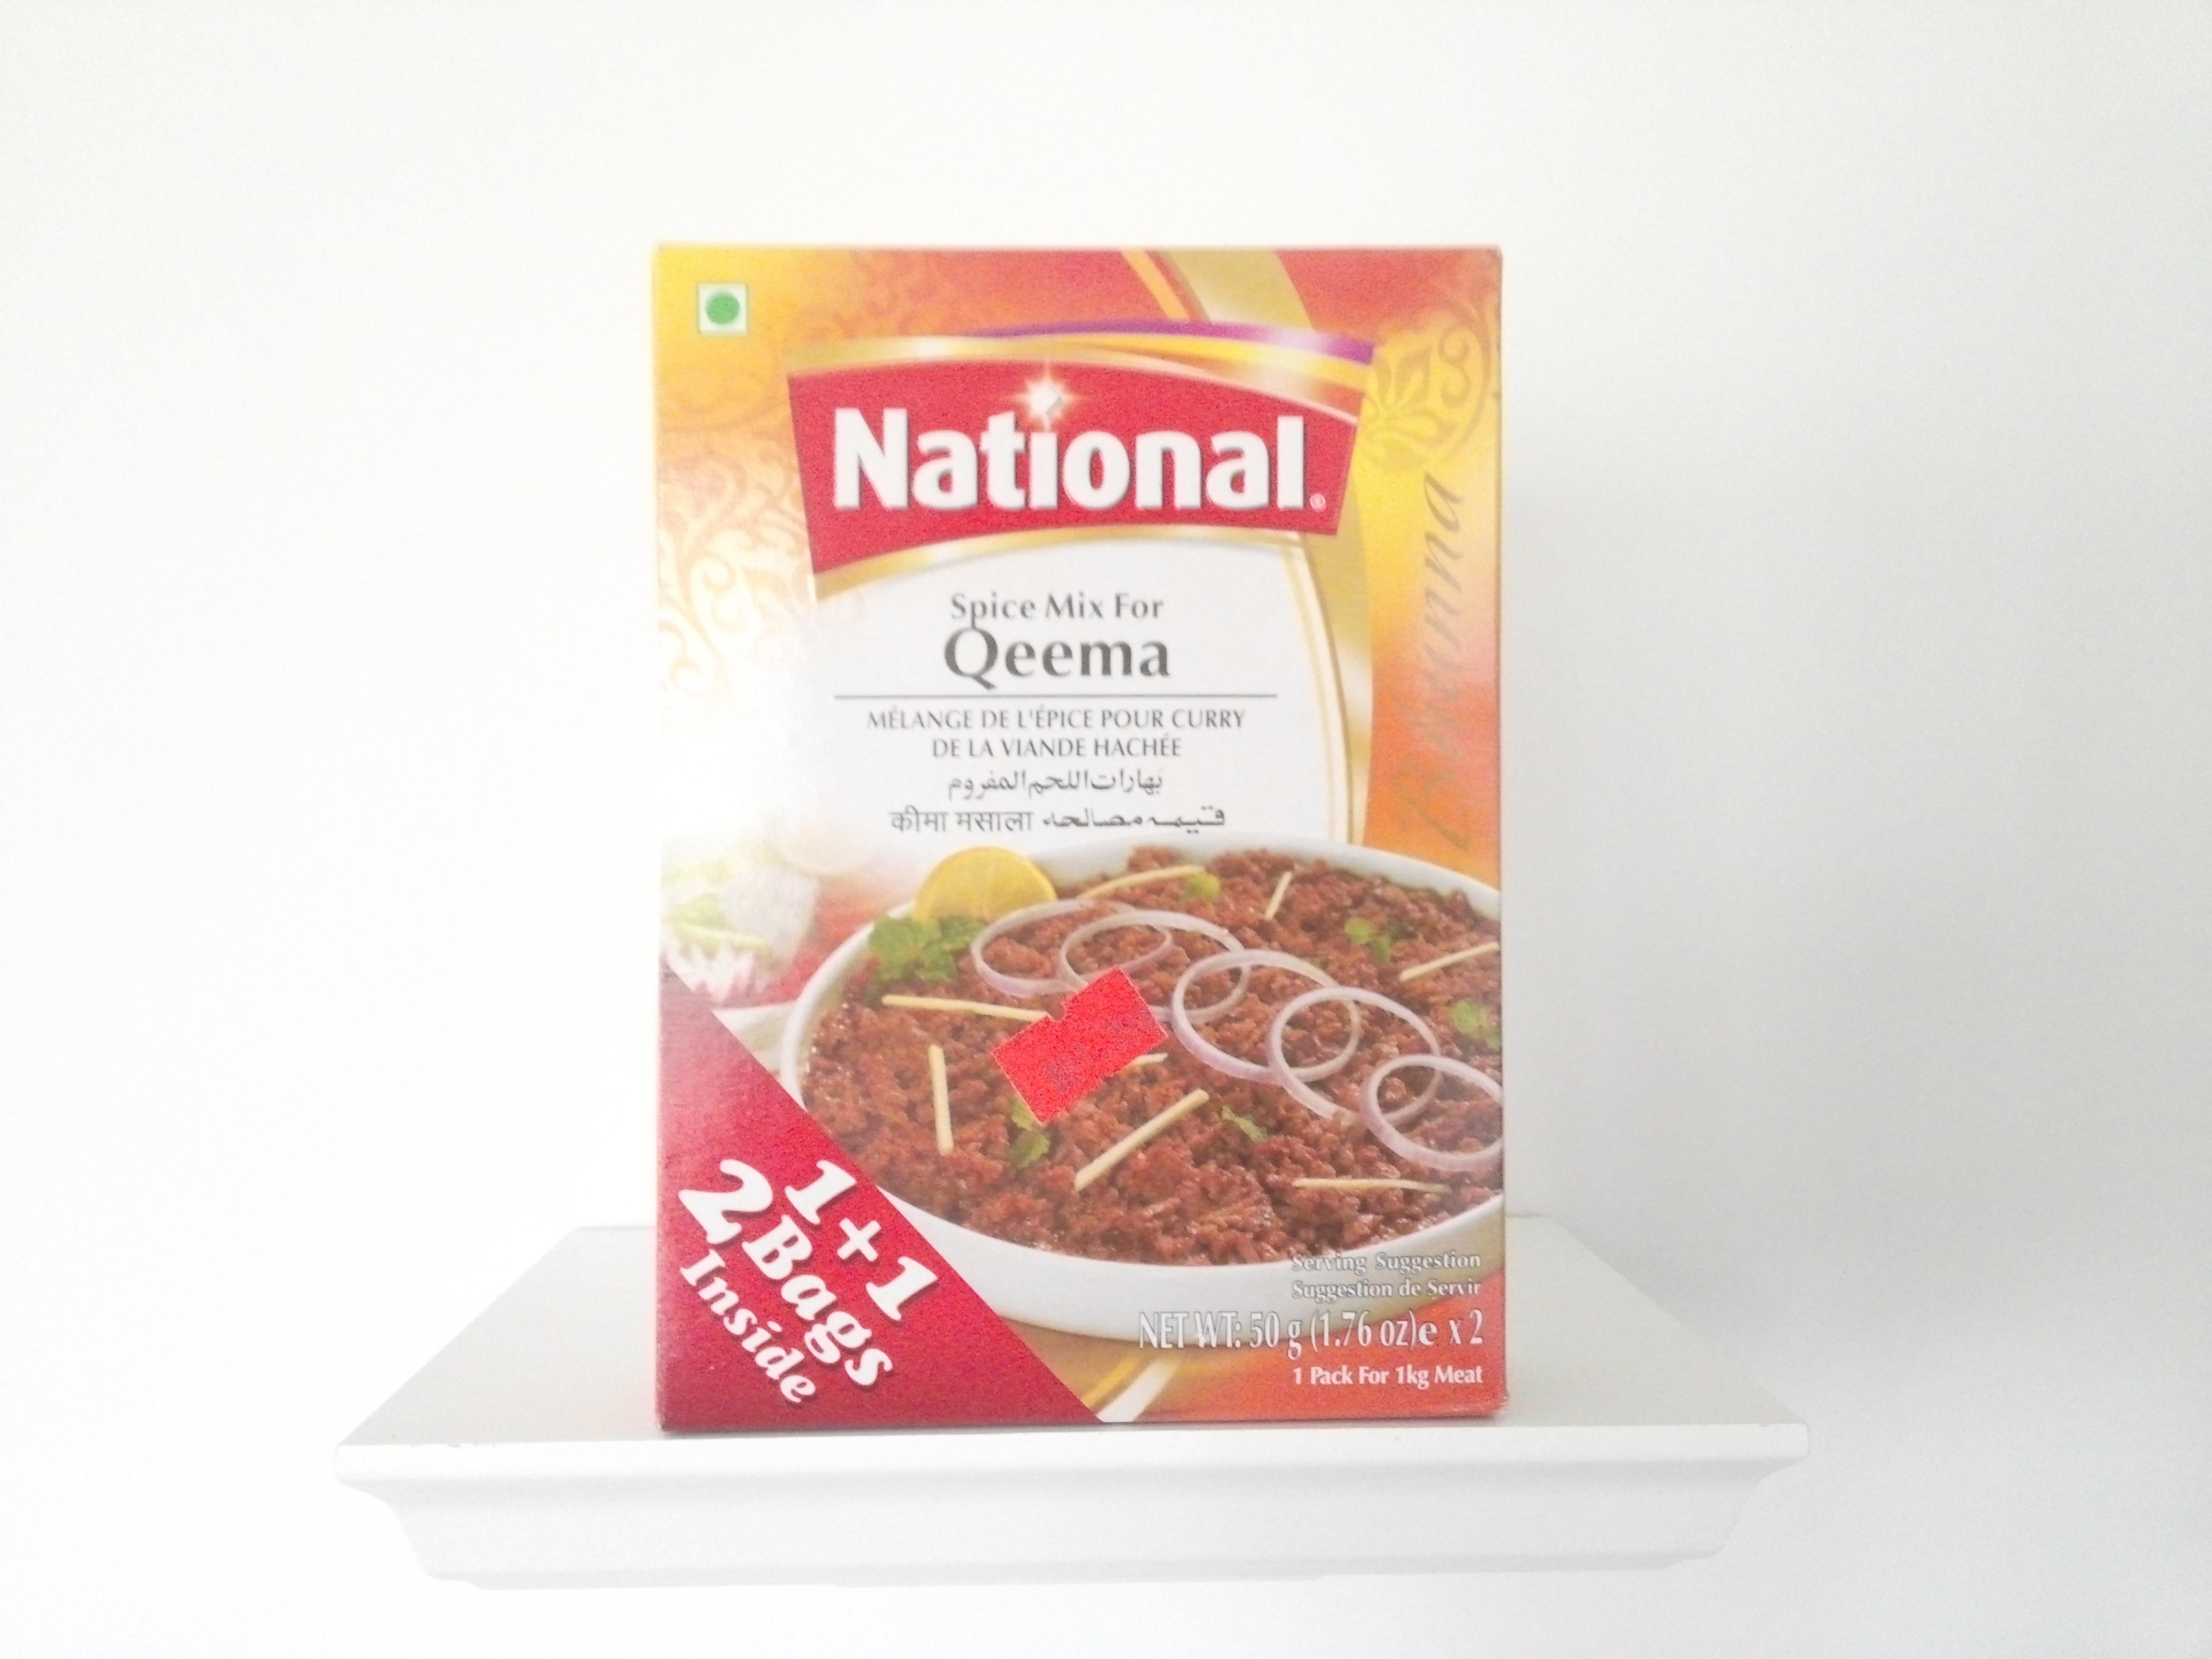 National Qeema Spice Mix 100 grm